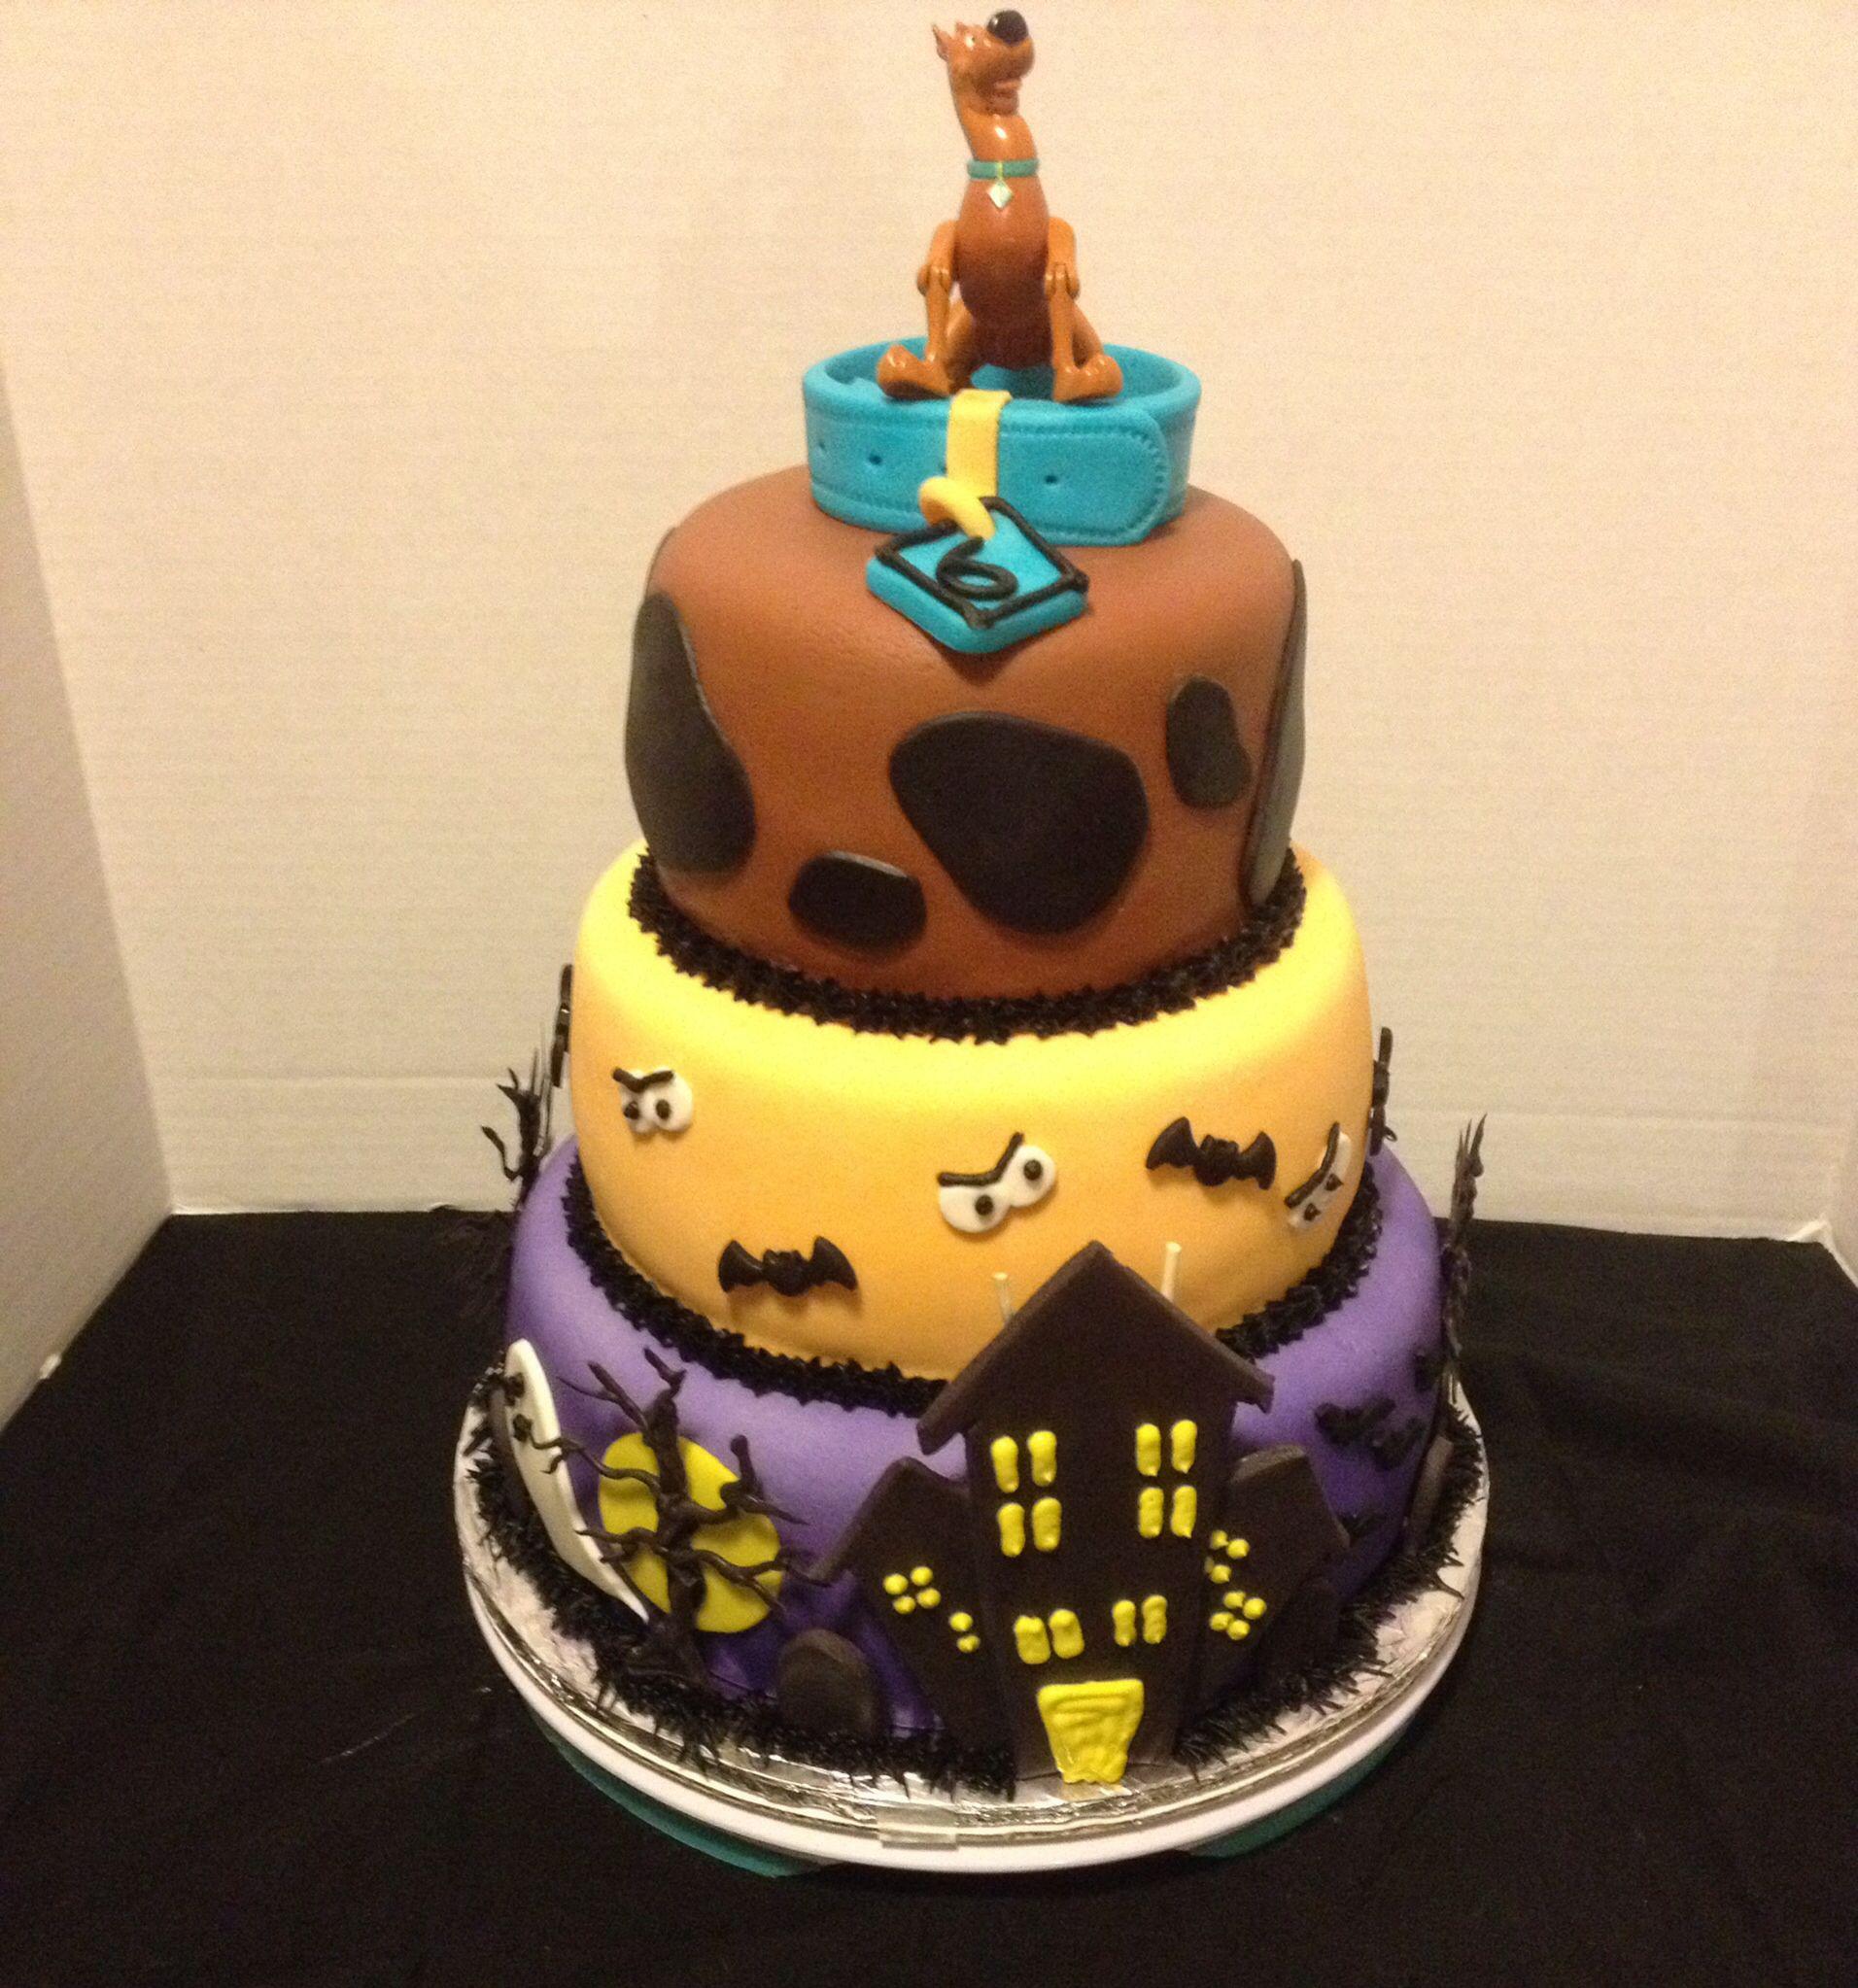 Scooby doo birthday cake Cakes I ve Made Pinterest